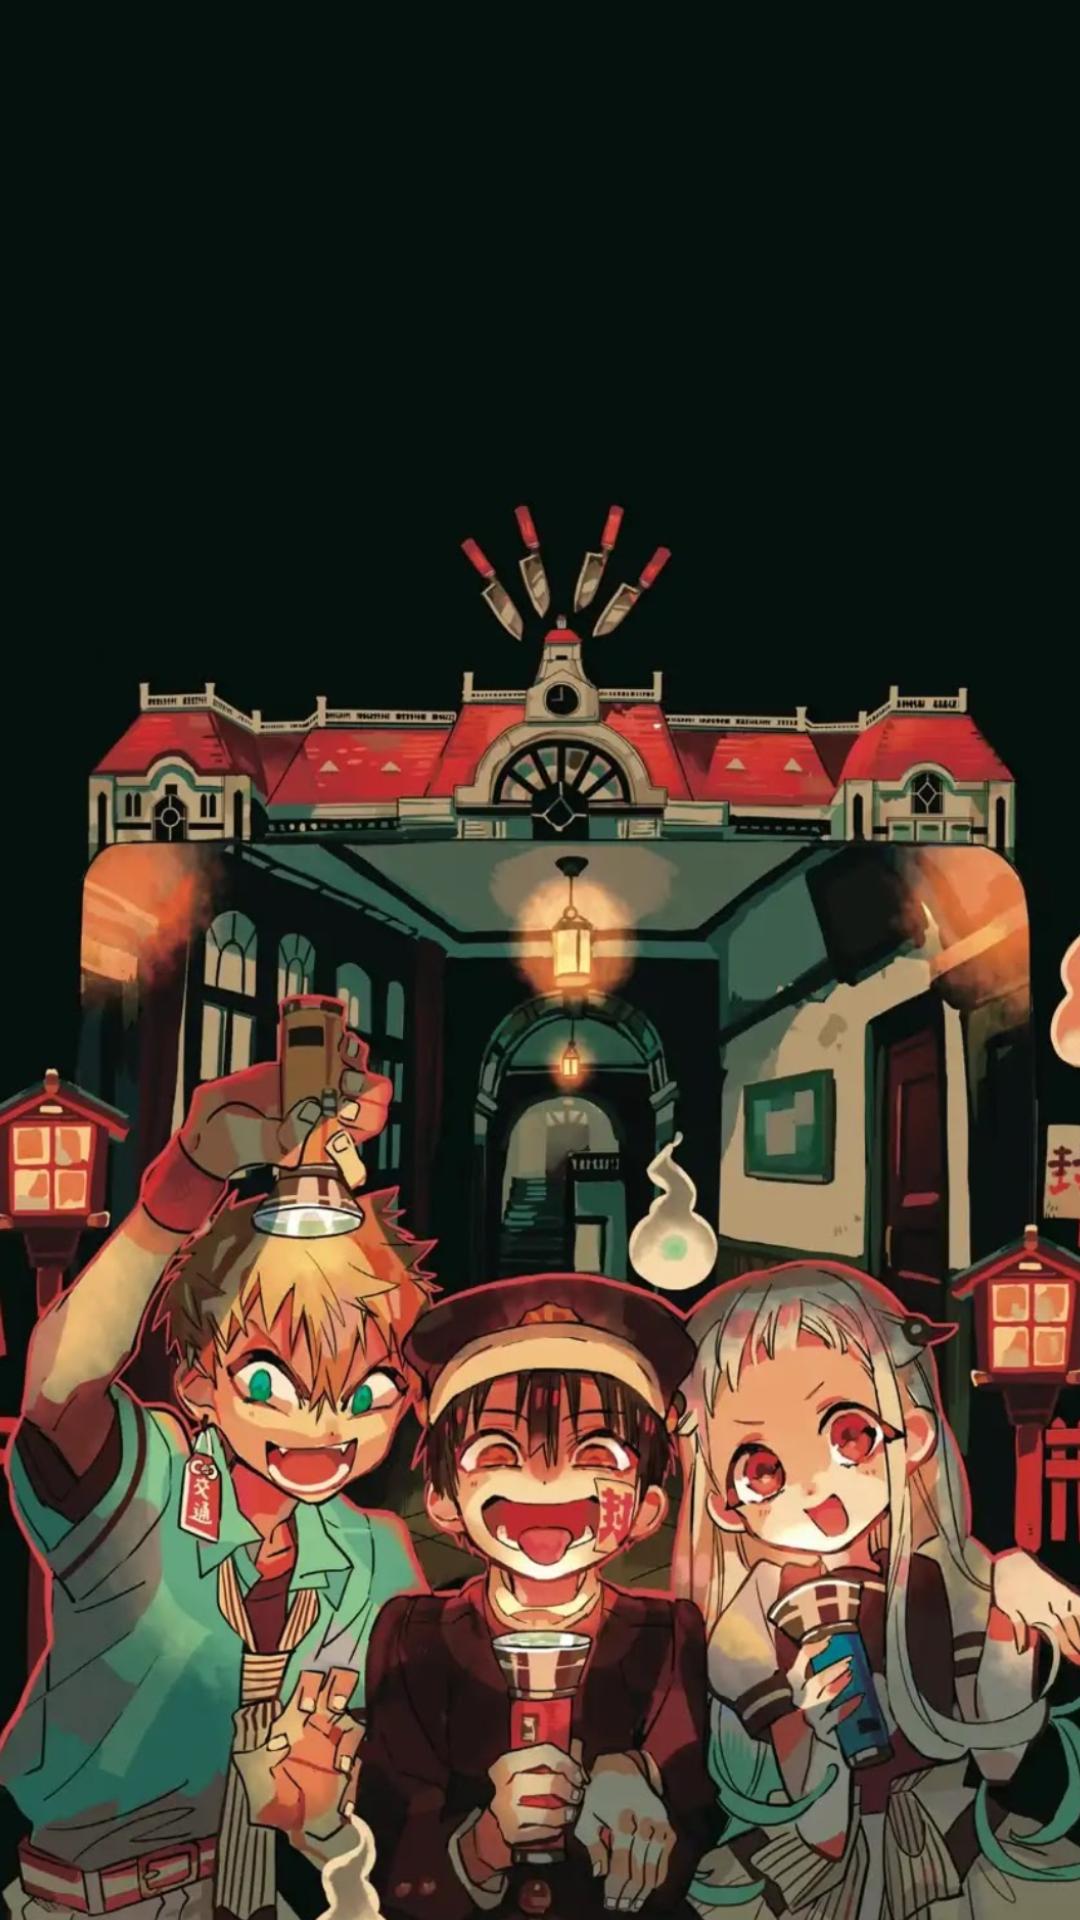 felipeelric — anime lockscreens in 2020 | Anime, Anime ...